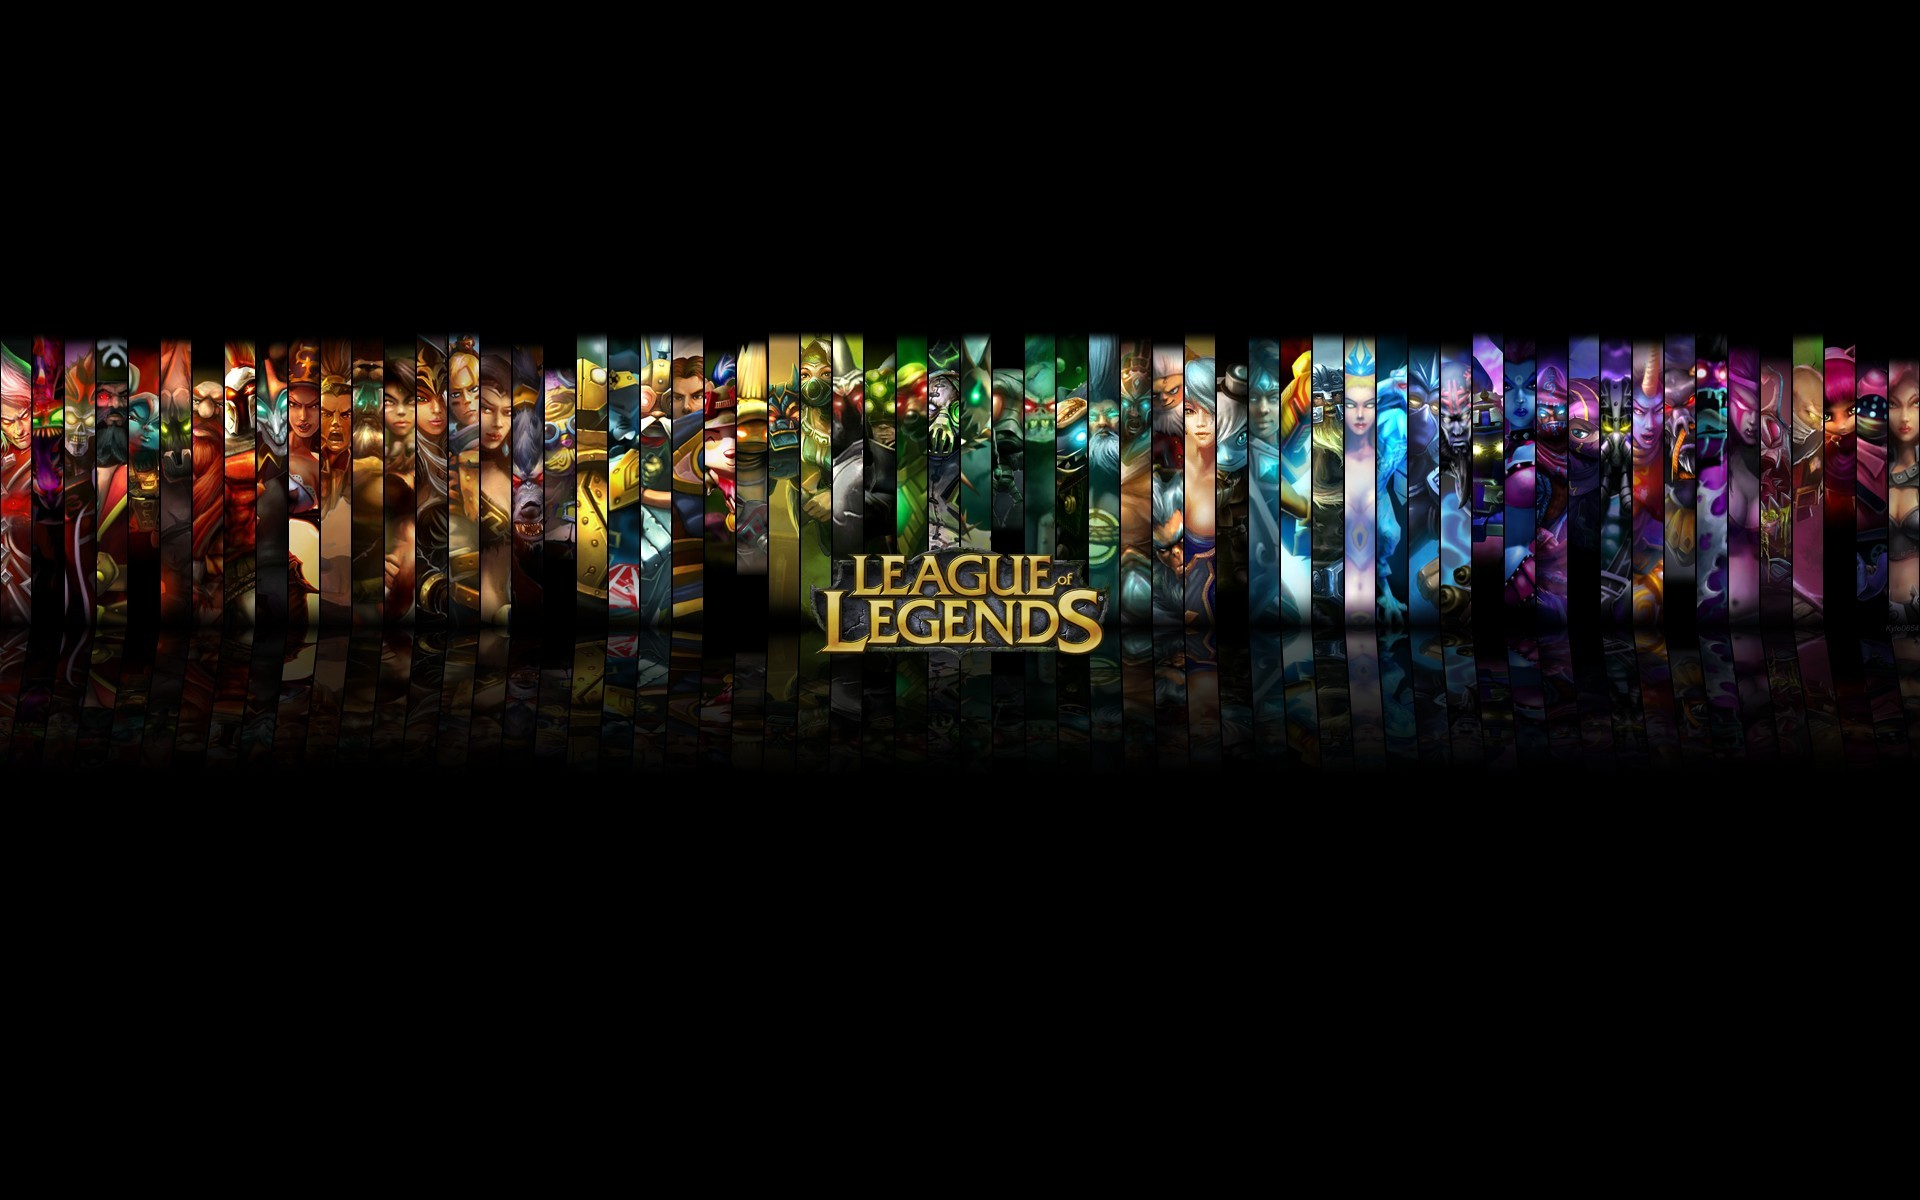 League Of Legends Wallpaper 100 Cover HD 1920×1200 Images